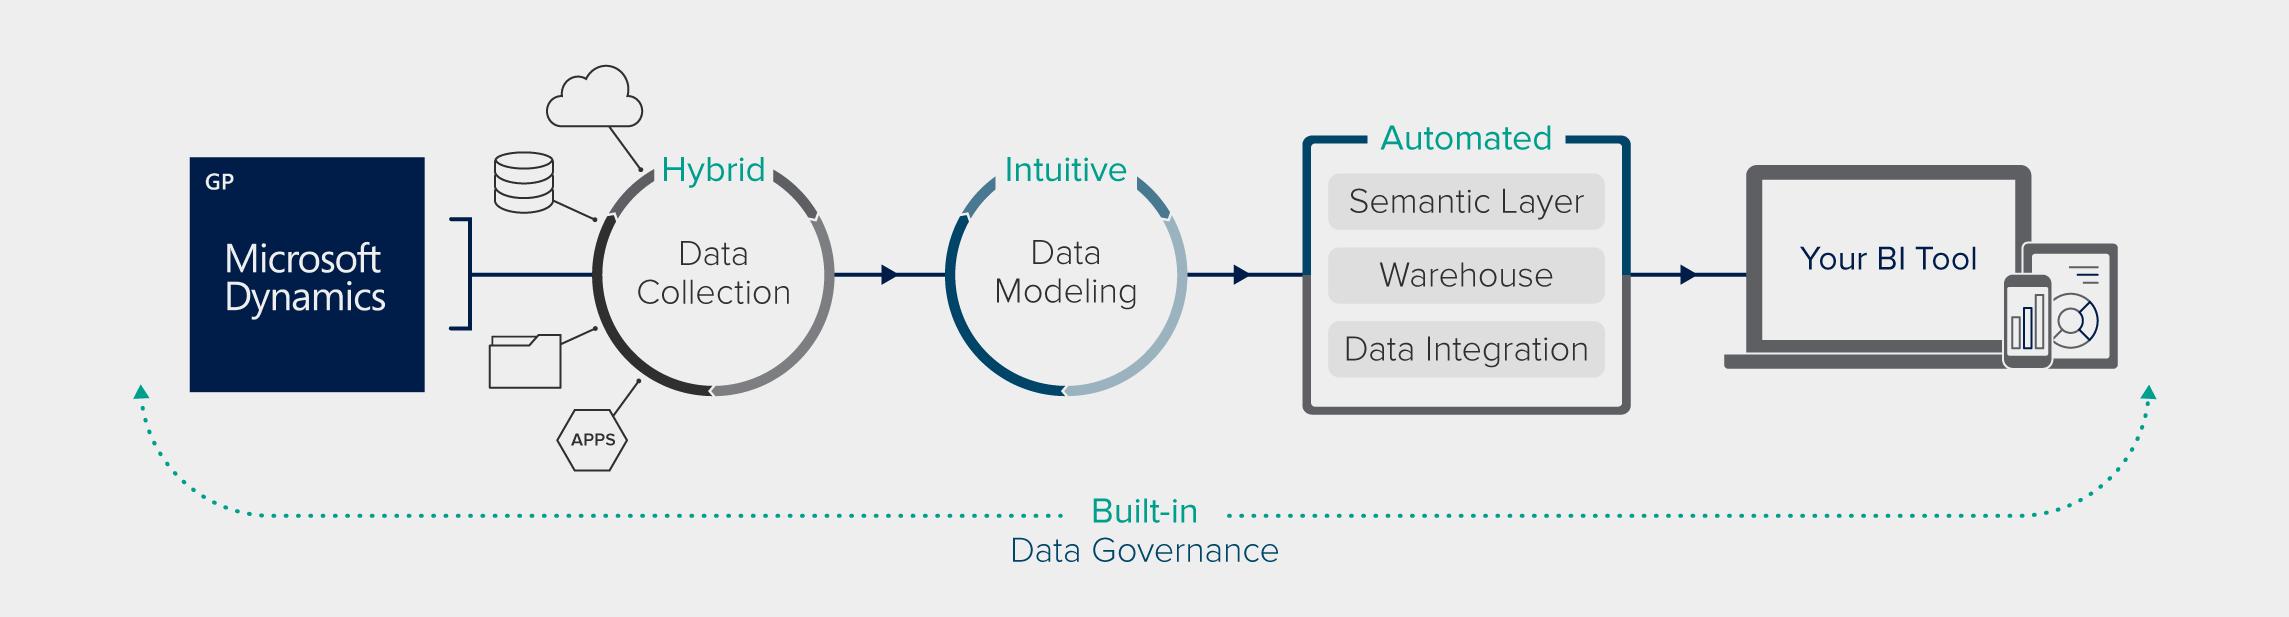 Dynamics GP data management and analytics software | ZAP